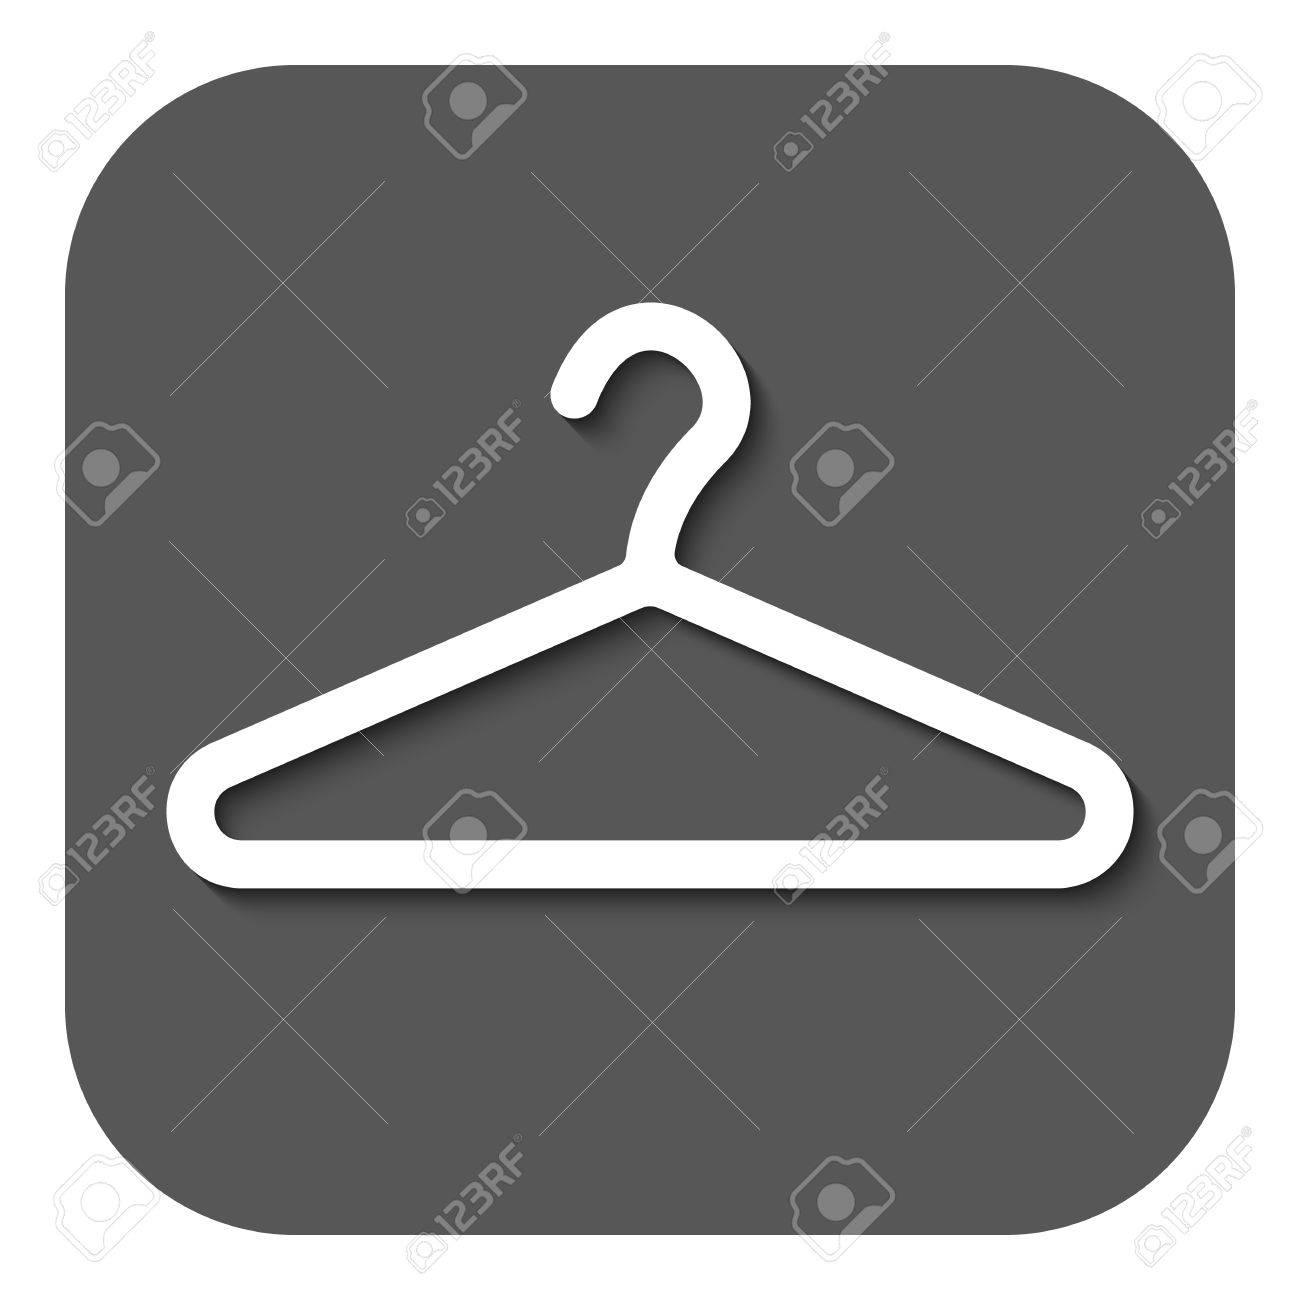 The hanger icon coat rack symbol flat vector illustration the hanger icon coat rack symbol flat vector illustration button stock vector buycottarizona